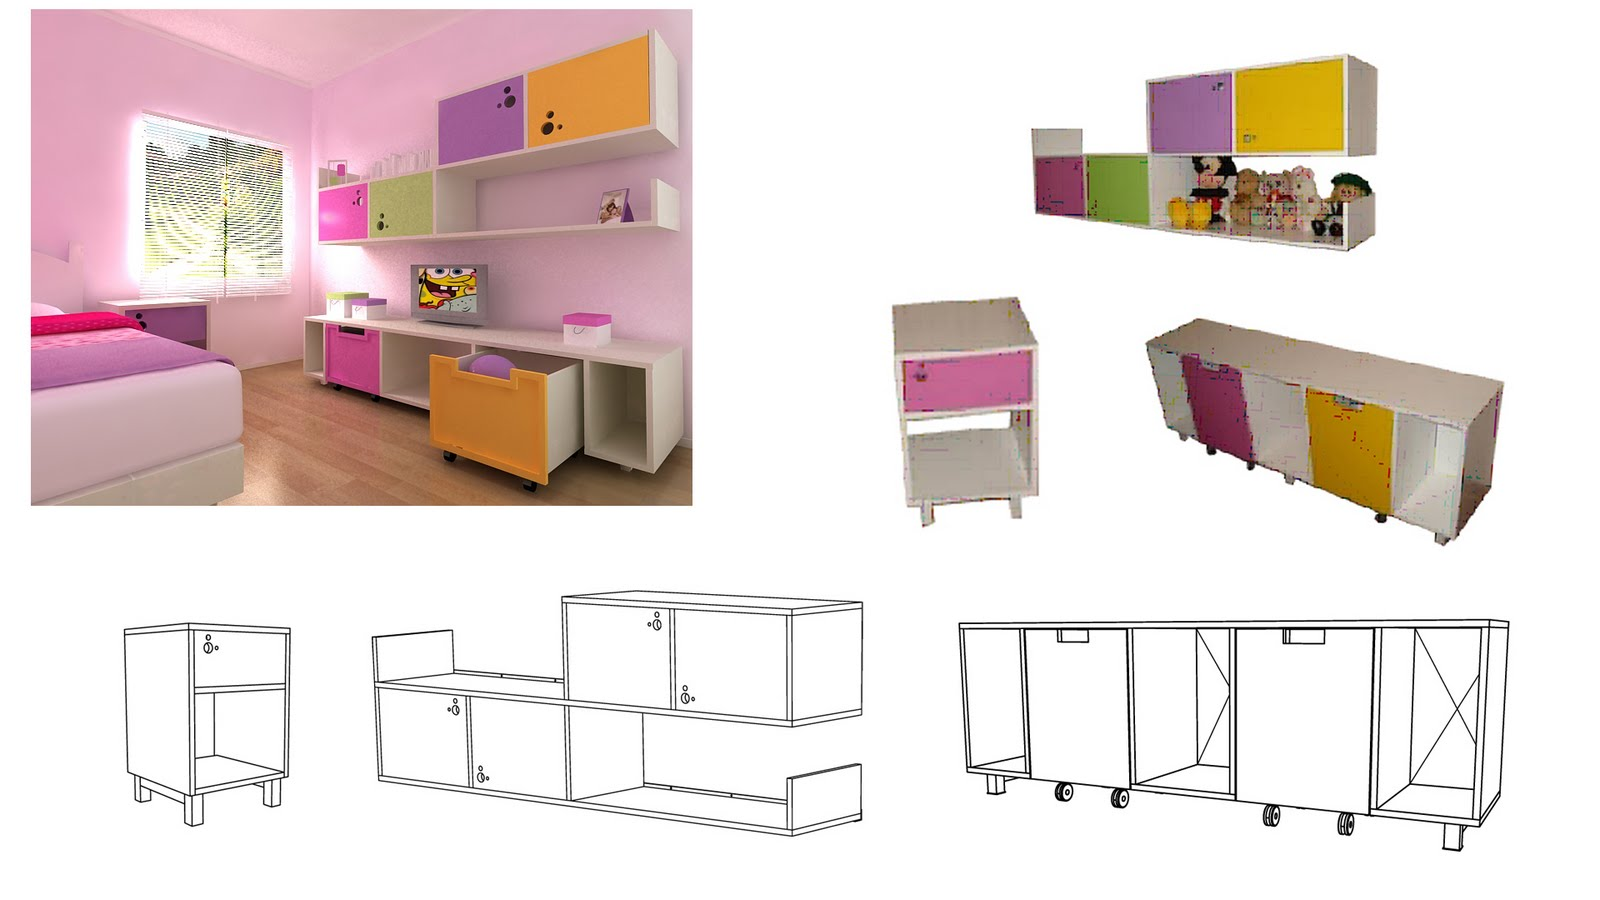 Portafolio muebles infantiles for Muebles infantiles zaragoza